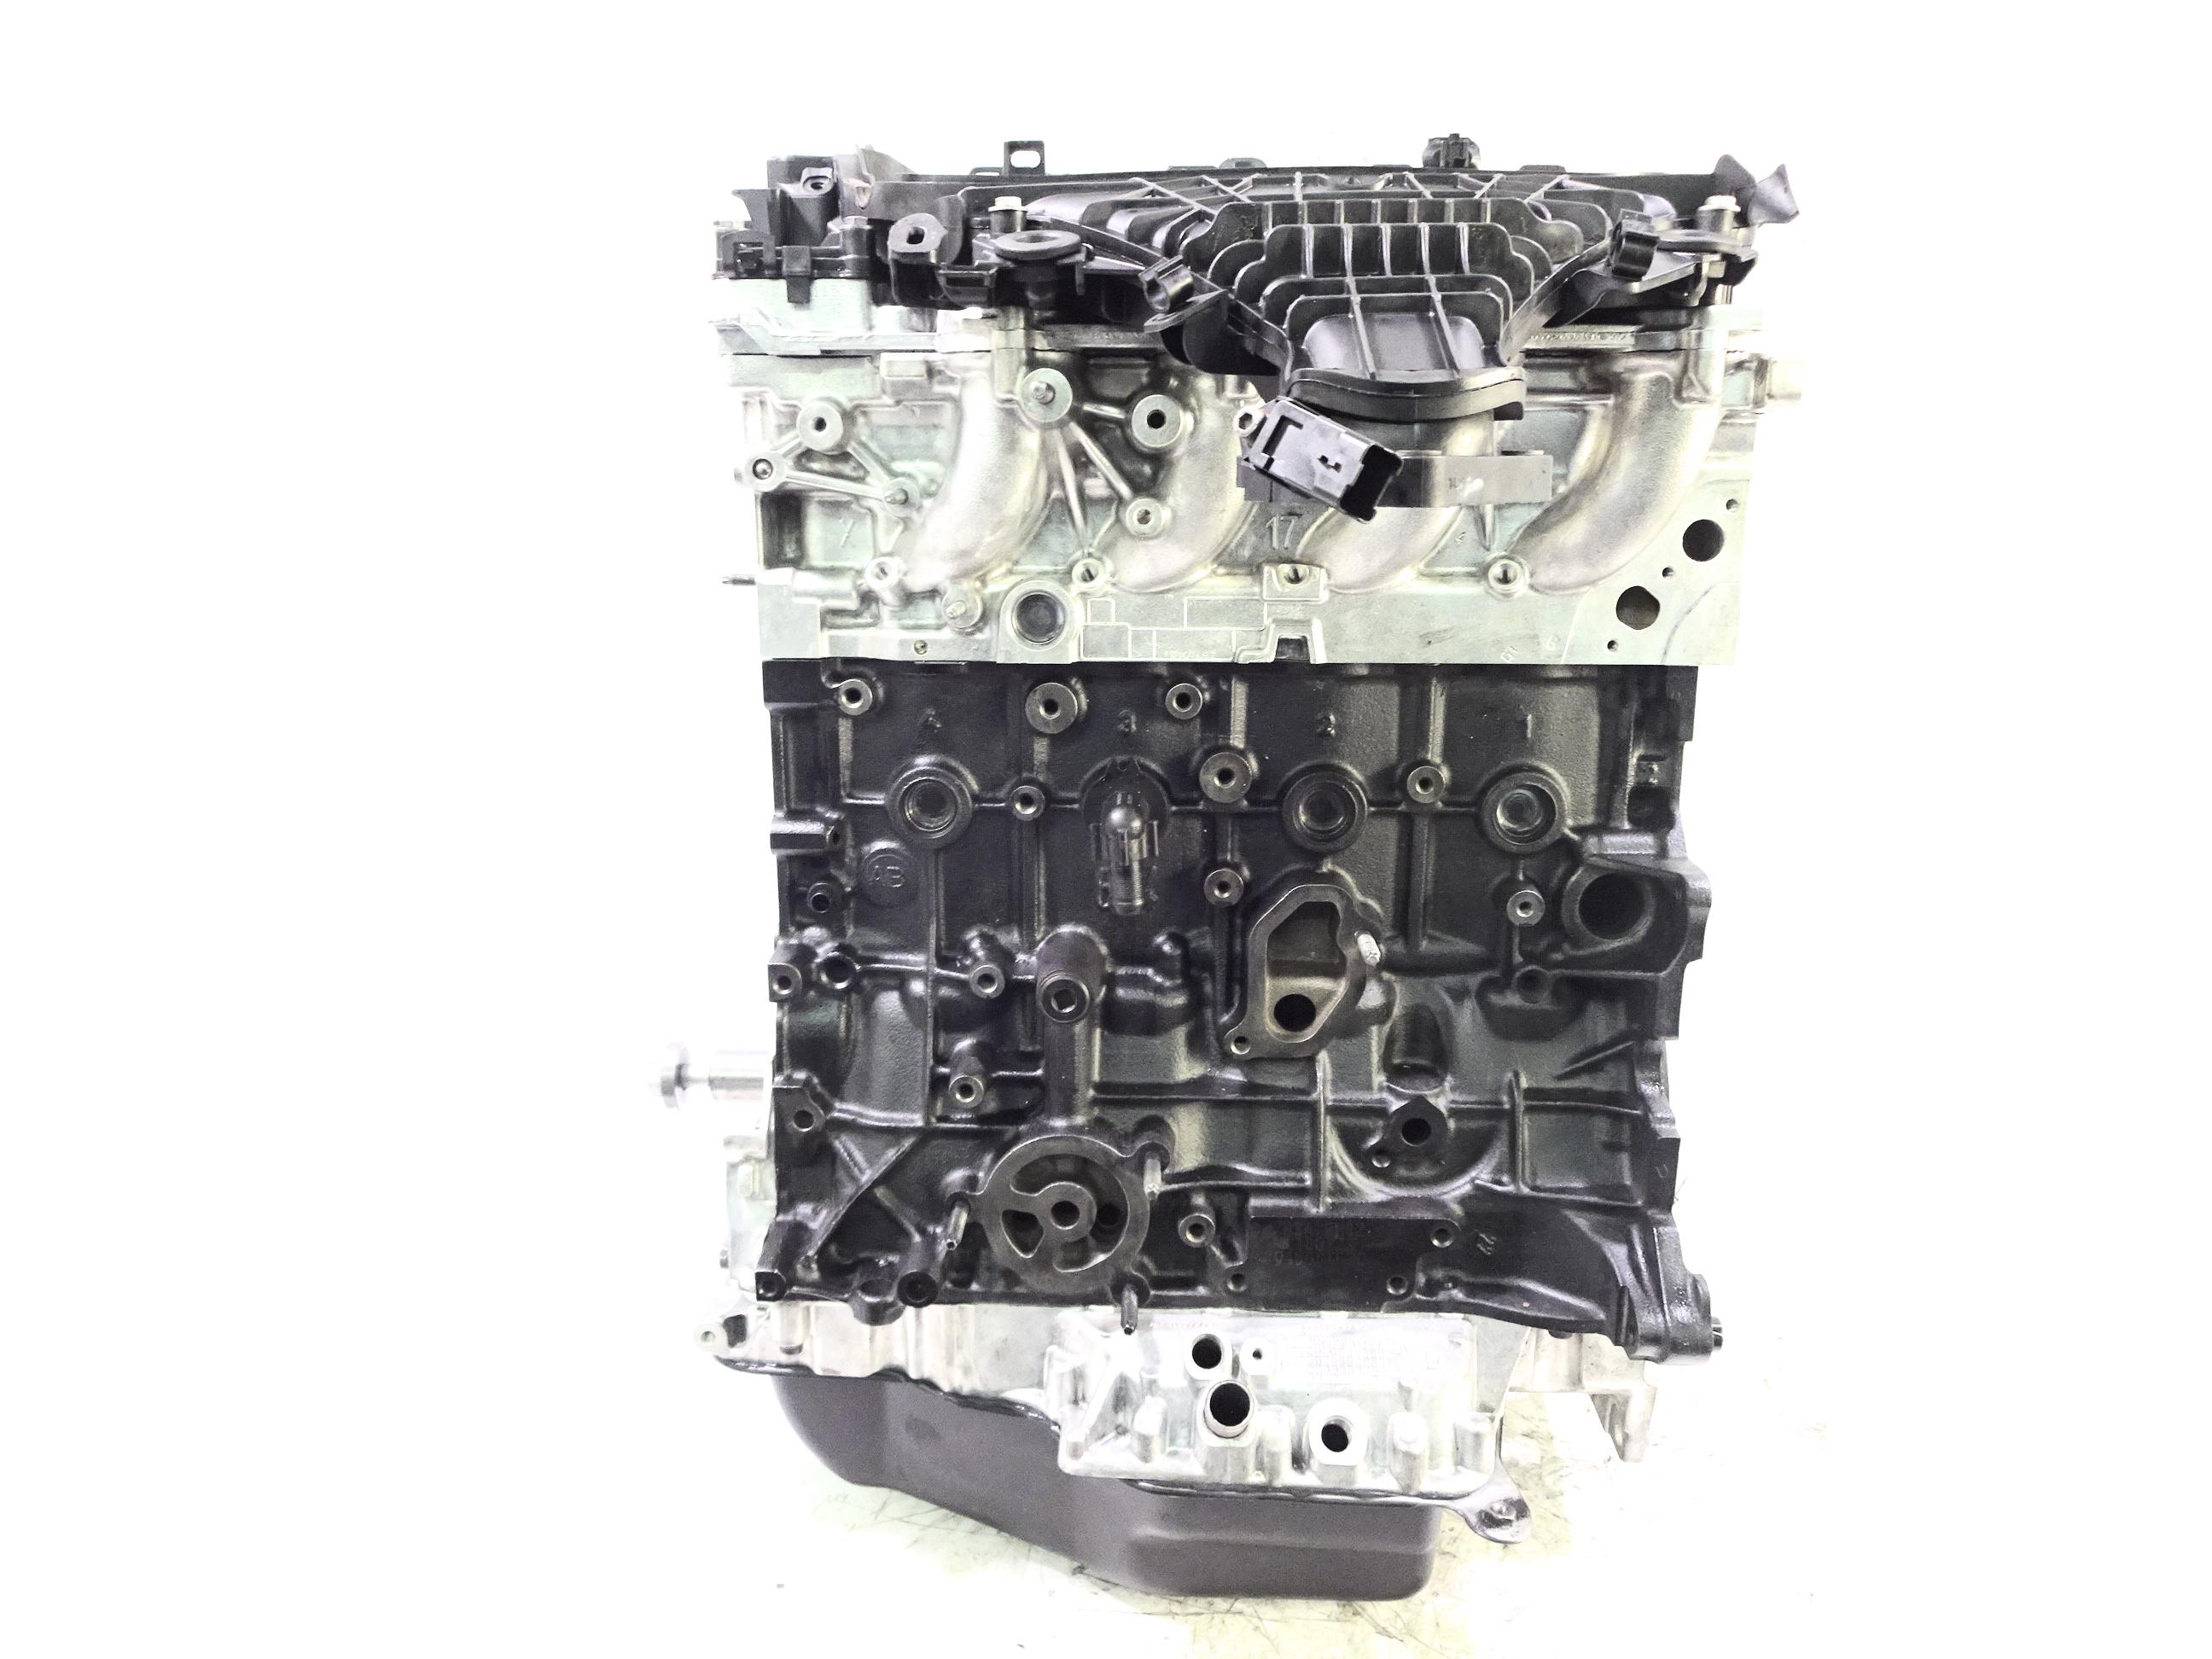 Motor 2012 Fiat 2,0 D Multijet RH02 Pleuellager Dichtung NEU Kopf geplant